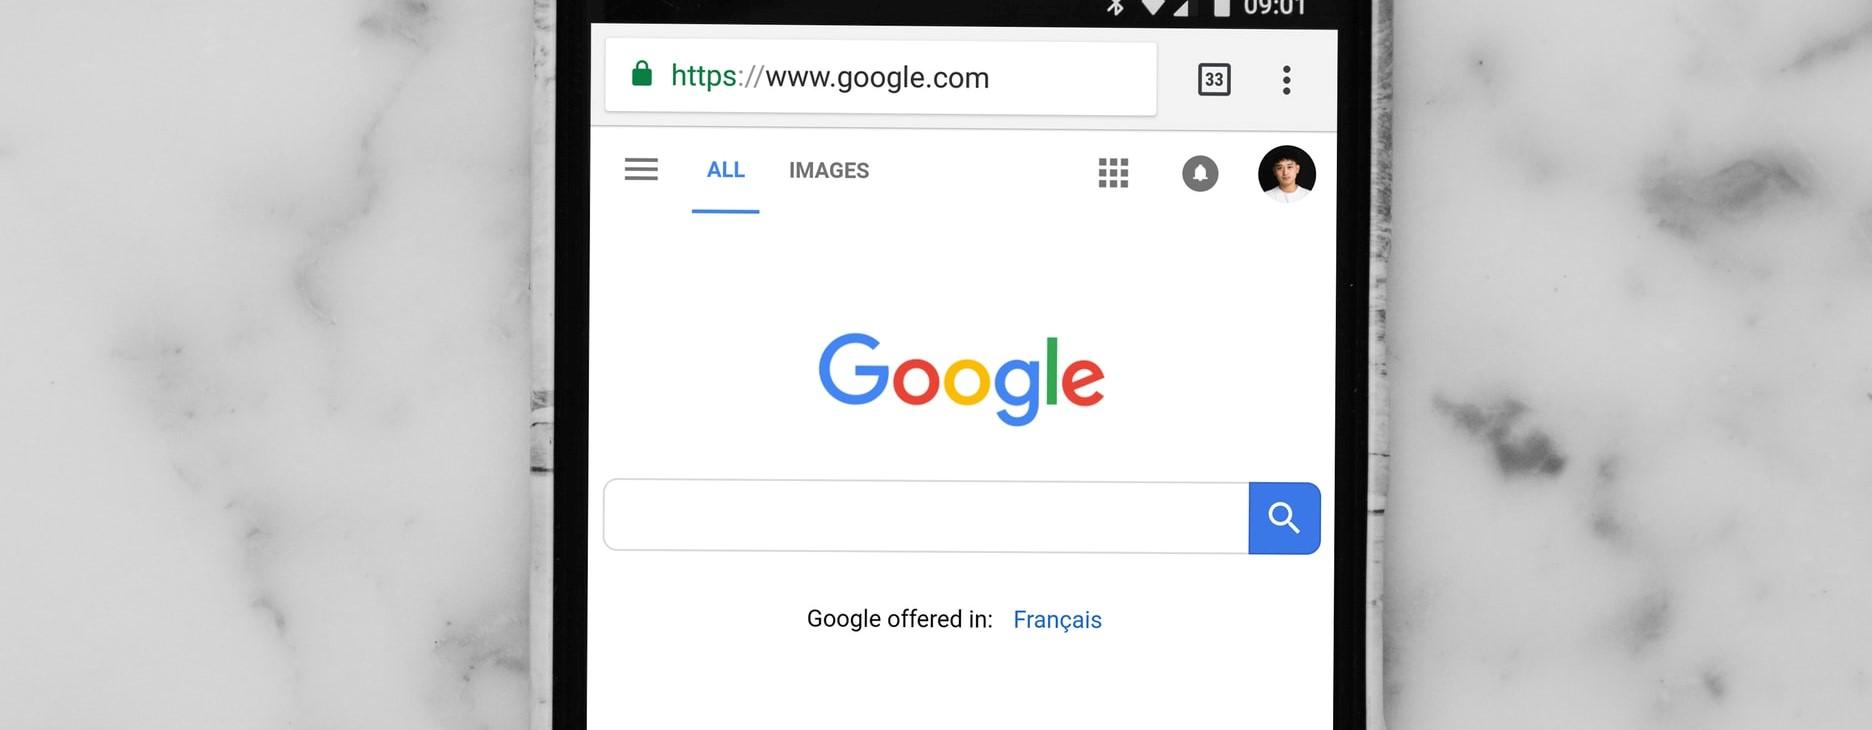 google-search-engine-mobile